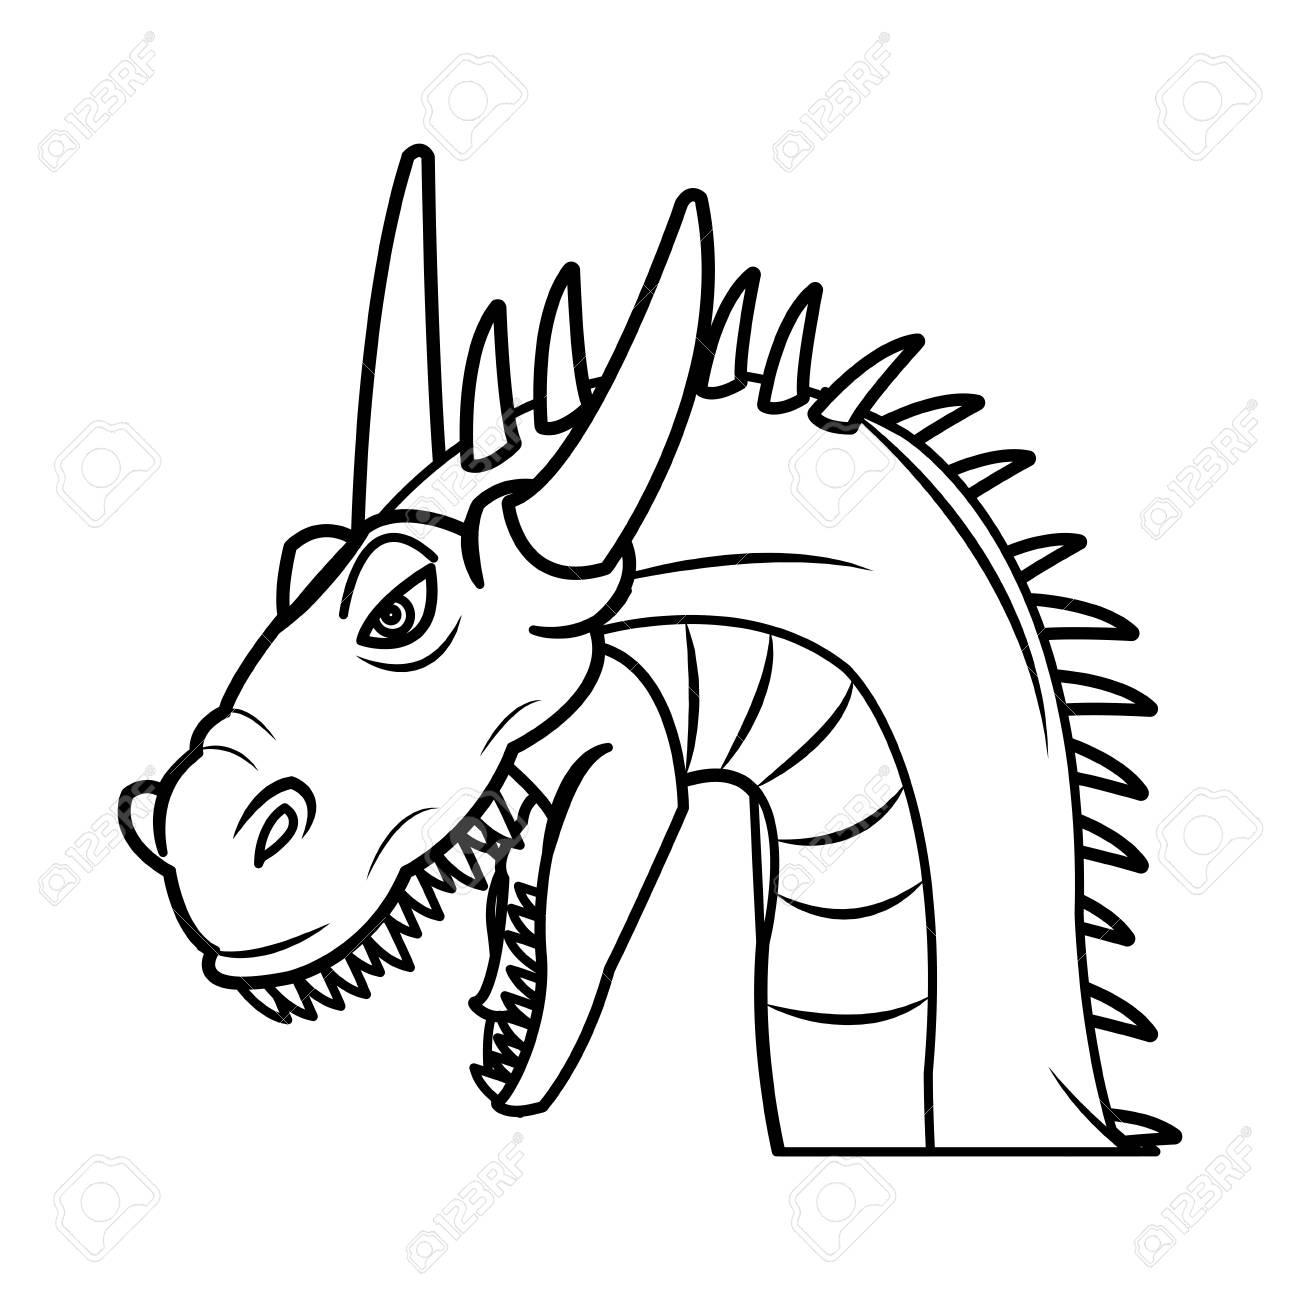 fairy tale dragon animal fantasy outline vector illustration stock vector 78518067 - Dragon Outline